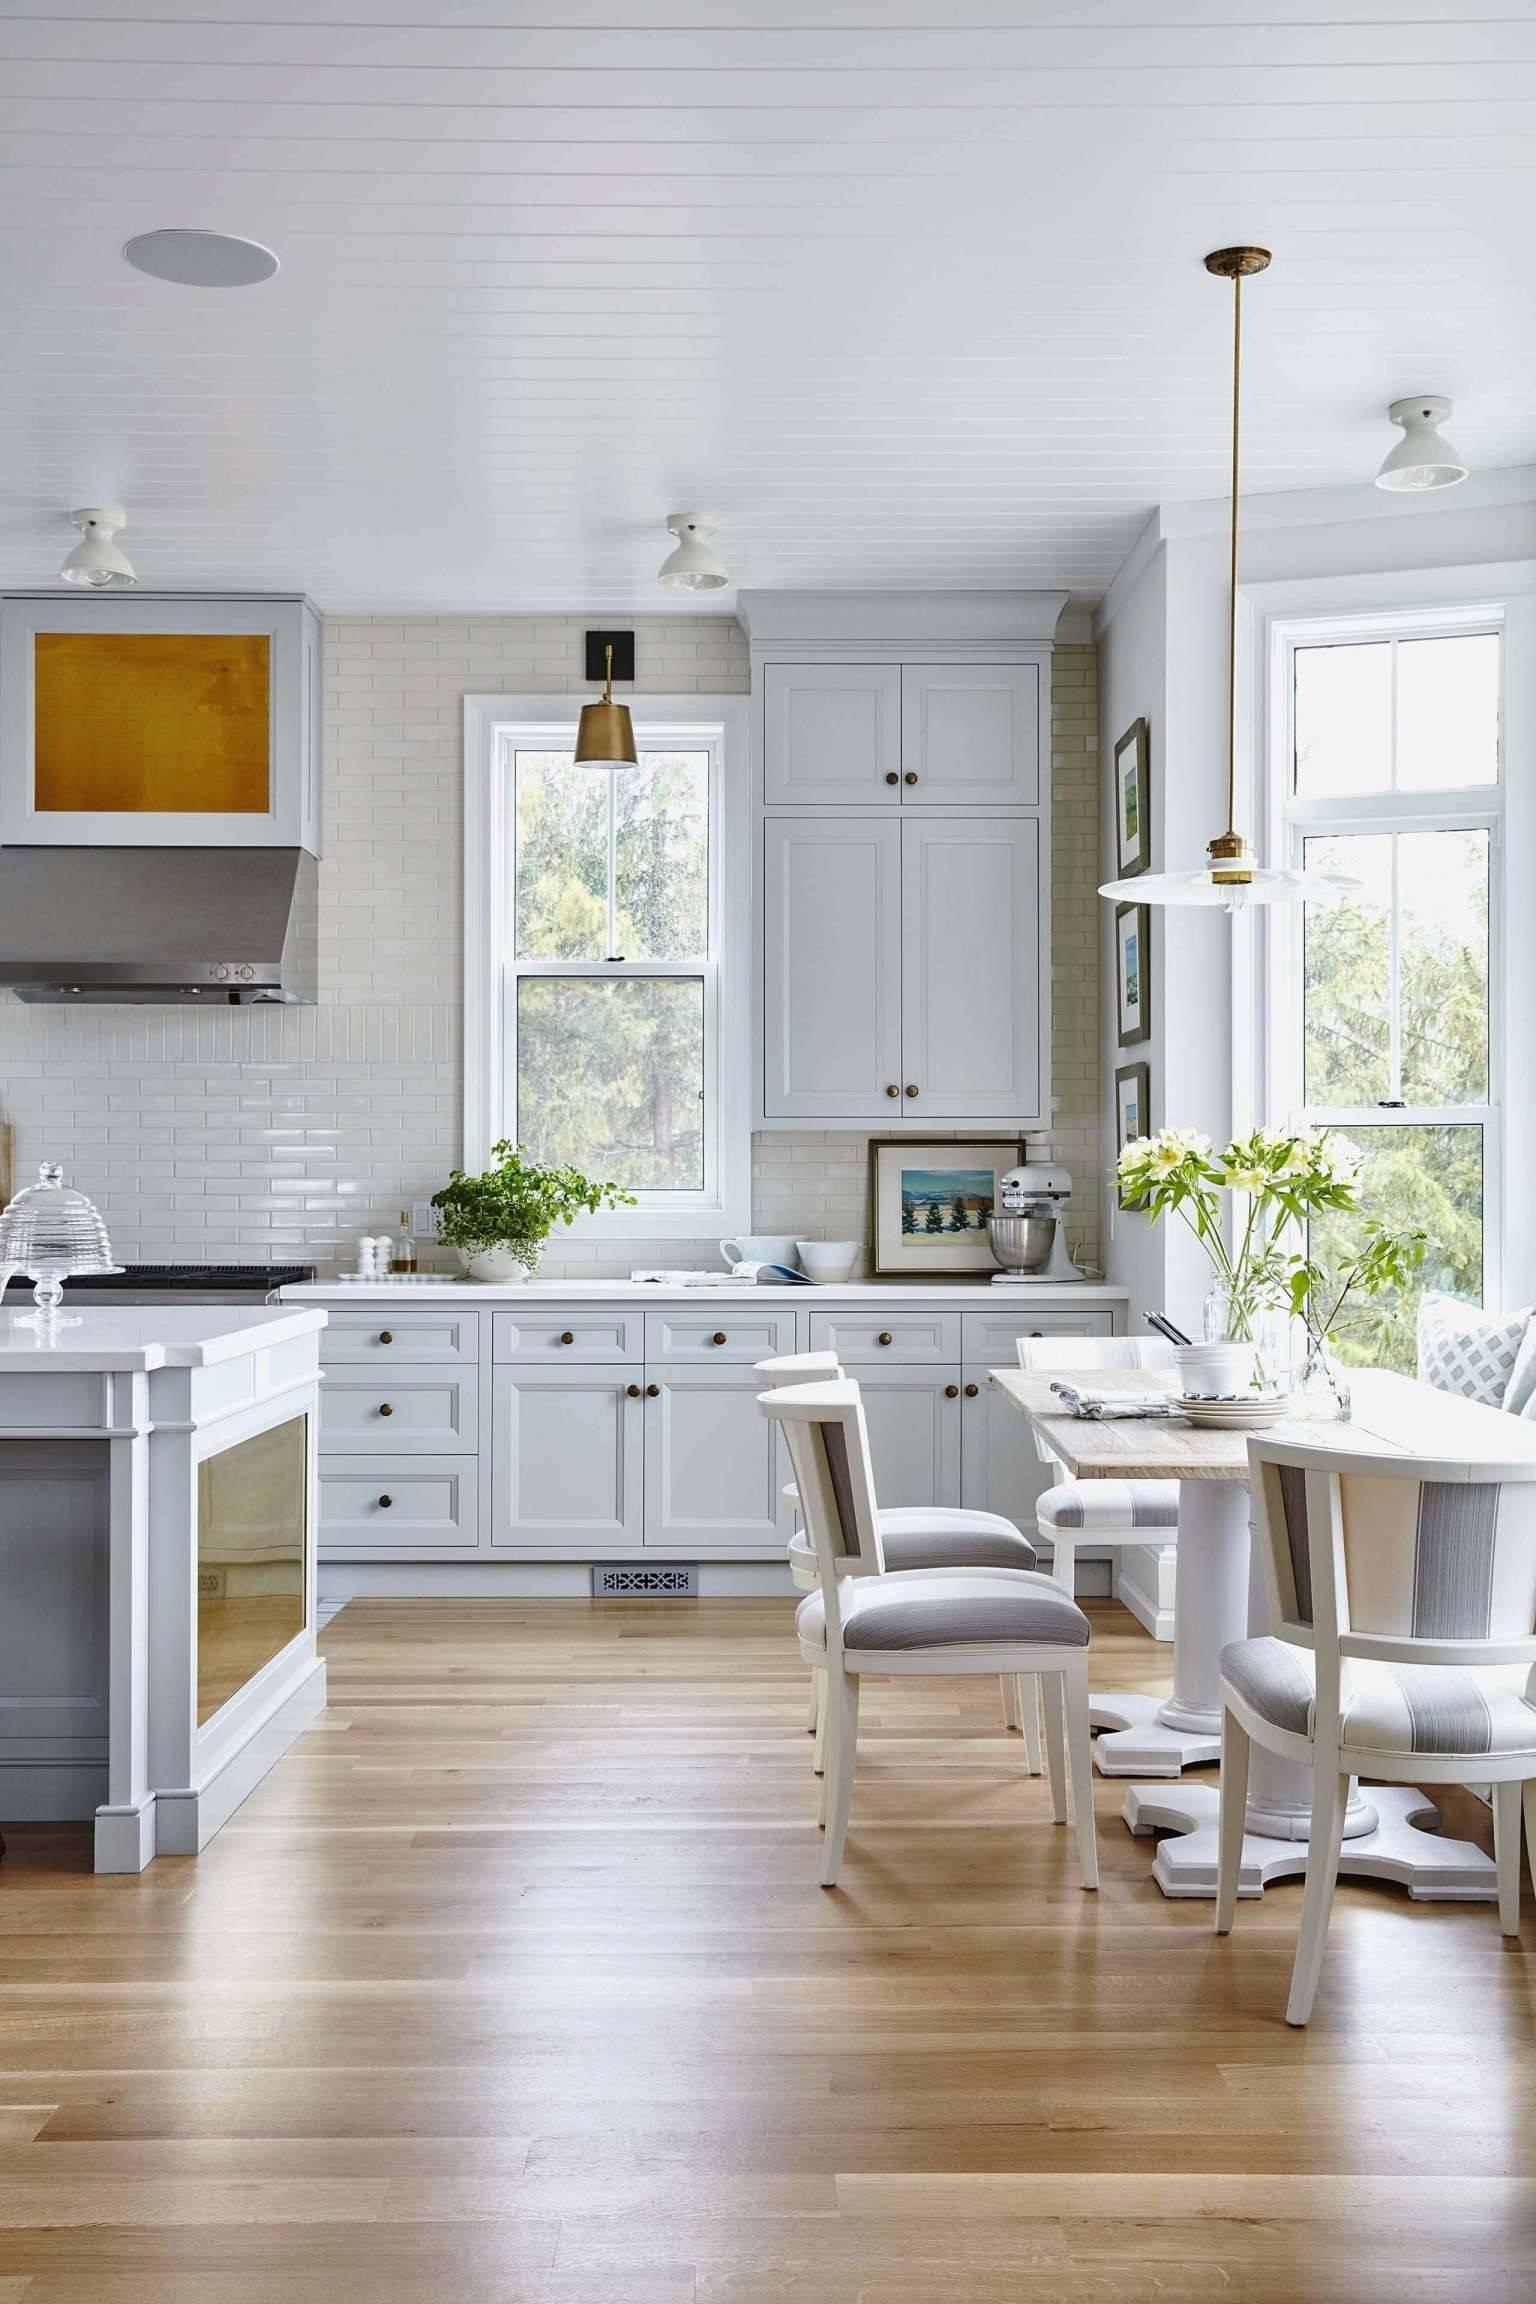 apartment decorating color schemes best of house paint colors ajjtimes of apartment decorating color schemes